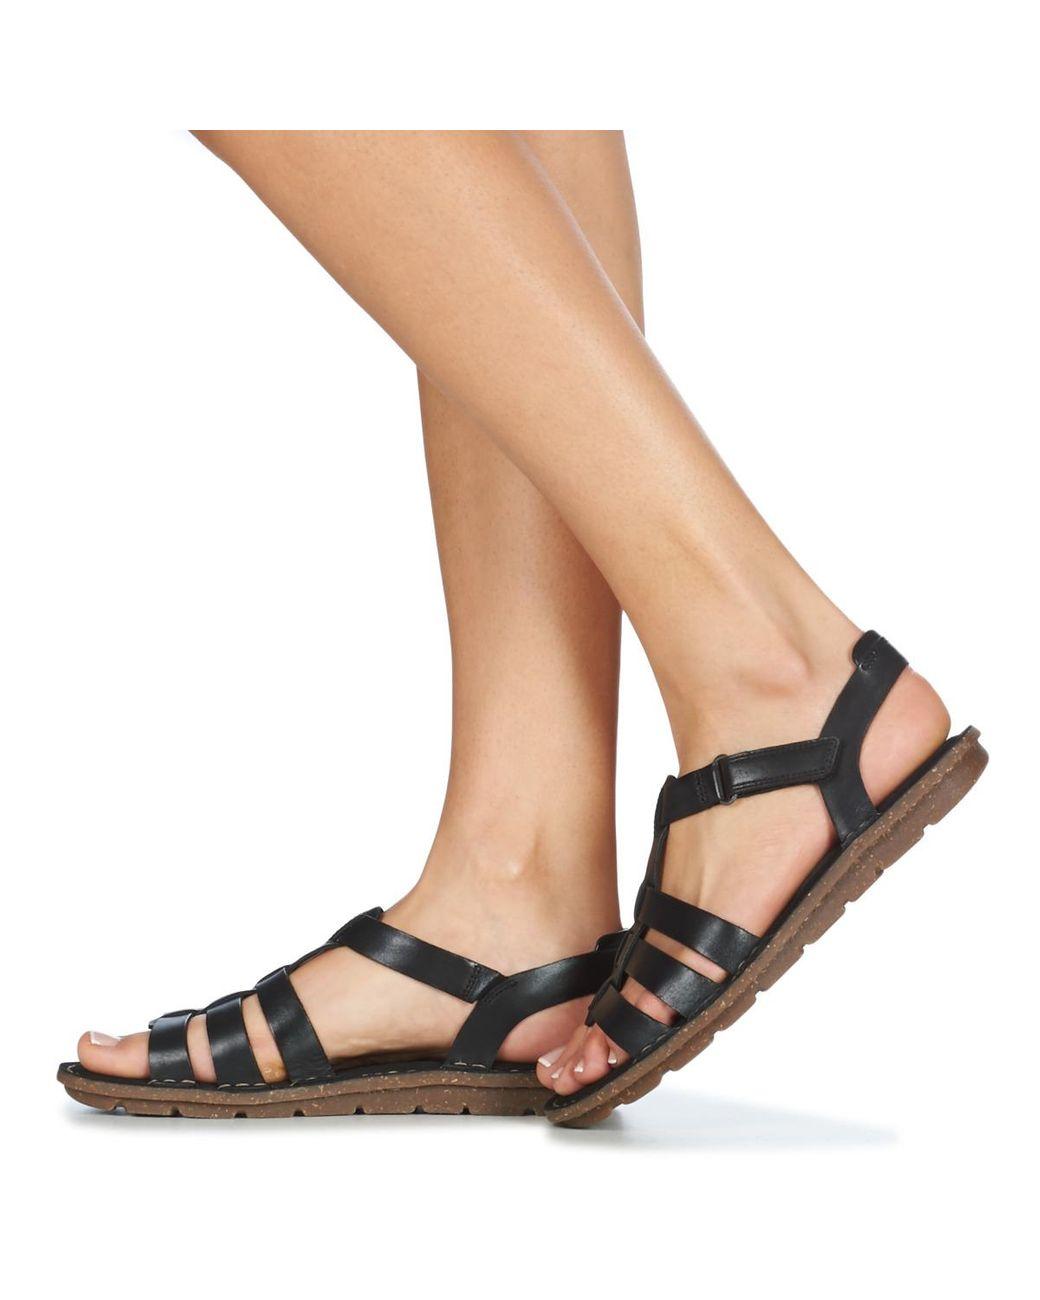 Clarks Blake Jewel Sandals in Black